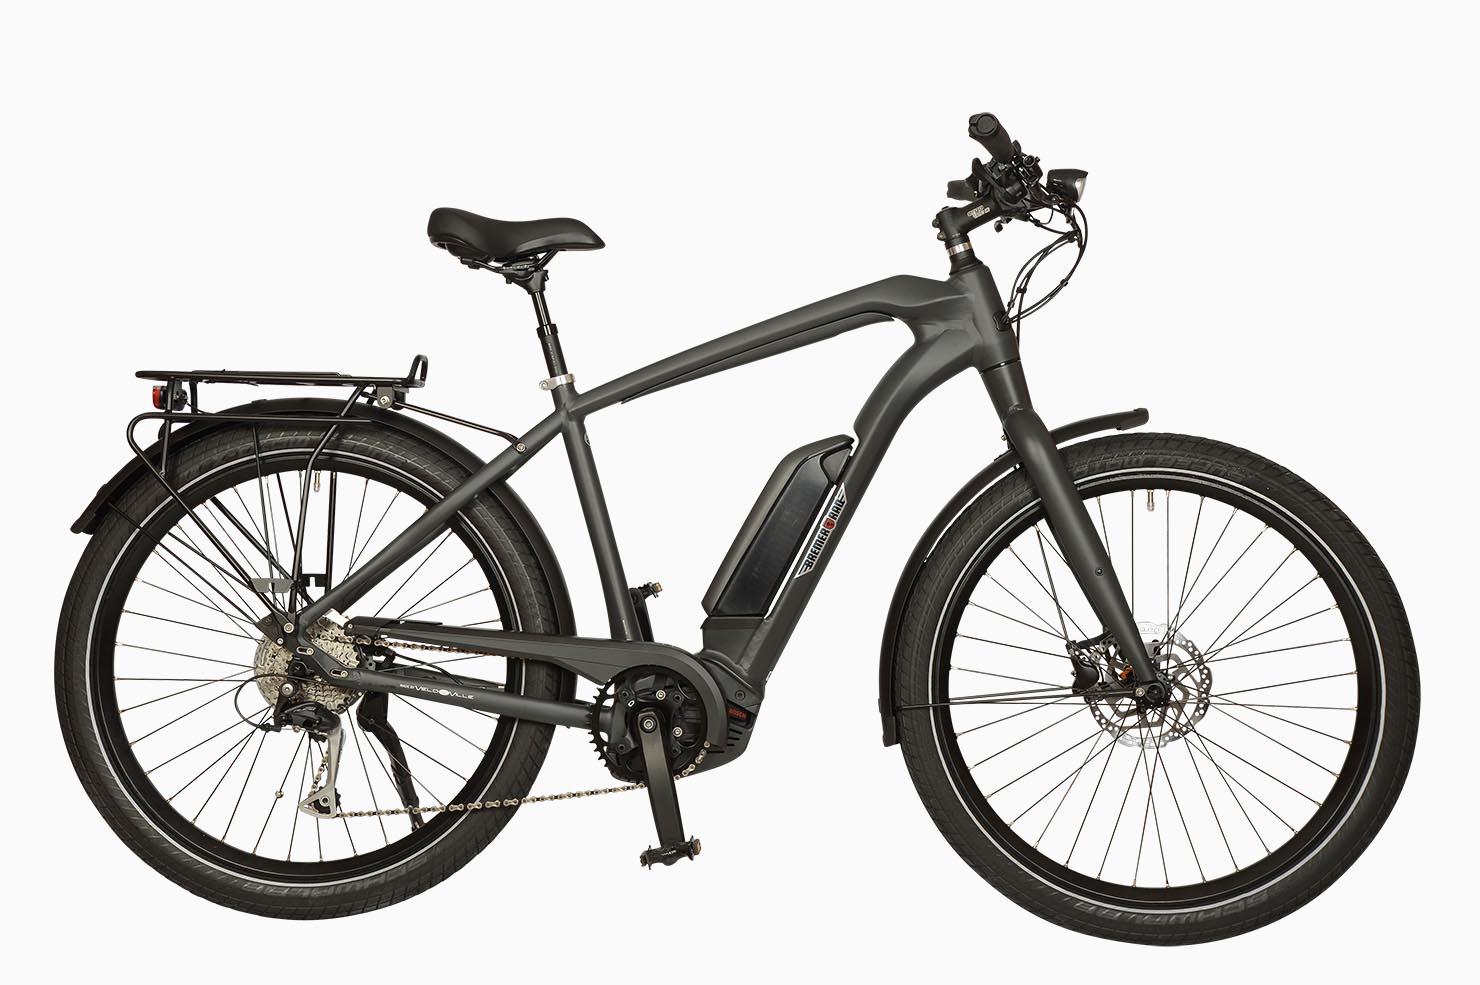 Fahrrad Griffe VELO Echt-Leder braun 90//90mm f 2 Drehgriffschaltungen